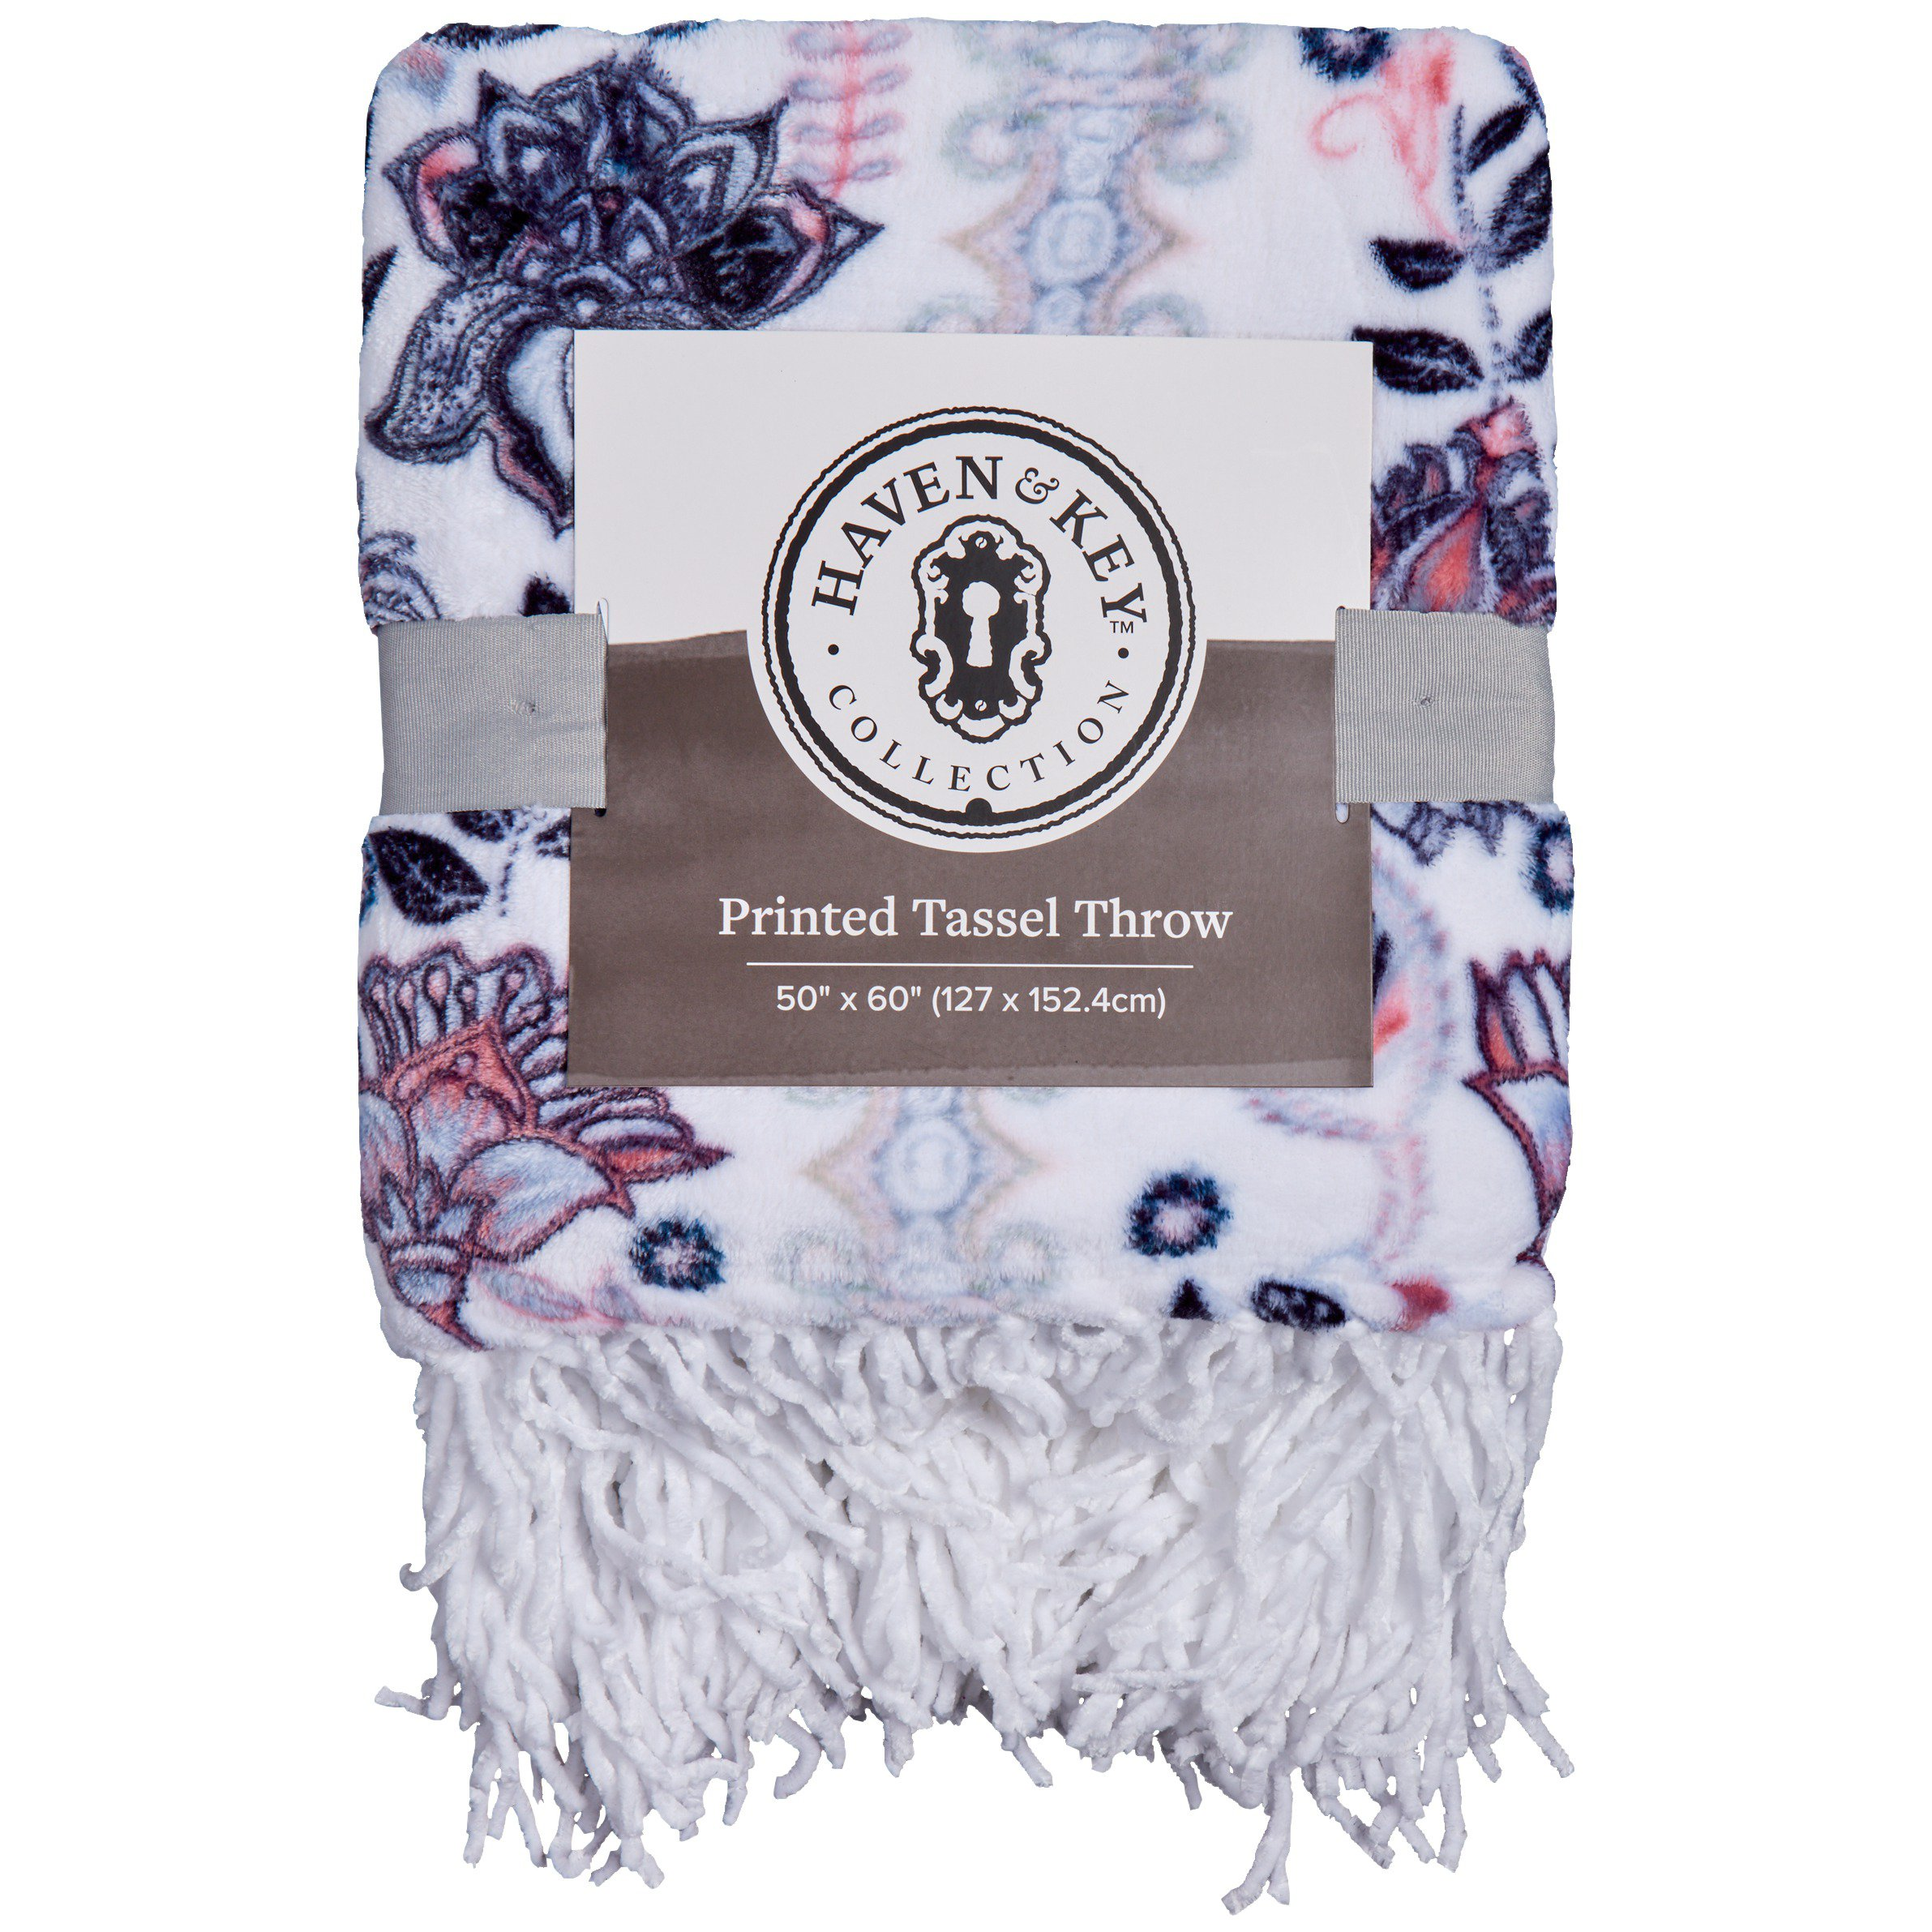 Haven Key Paisley Stripe Floral Tassel Throw Shop Blankets Throws At H E B